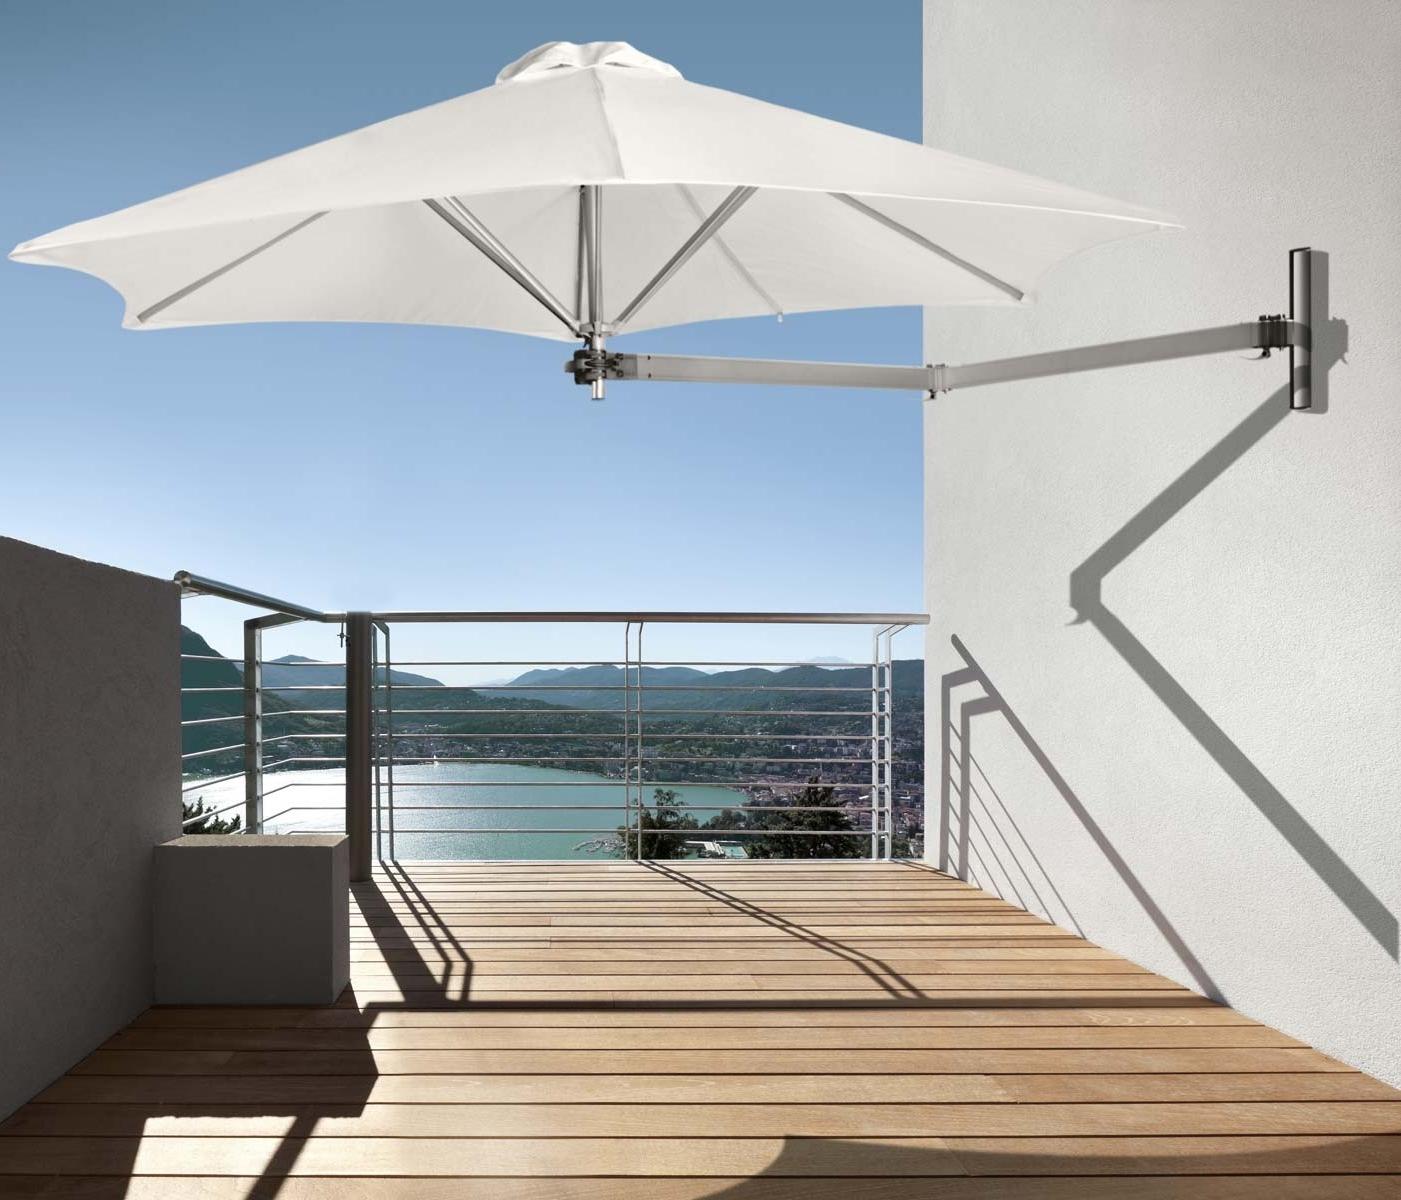 Copy of Paraflex wall mounted sunbrella.jpg